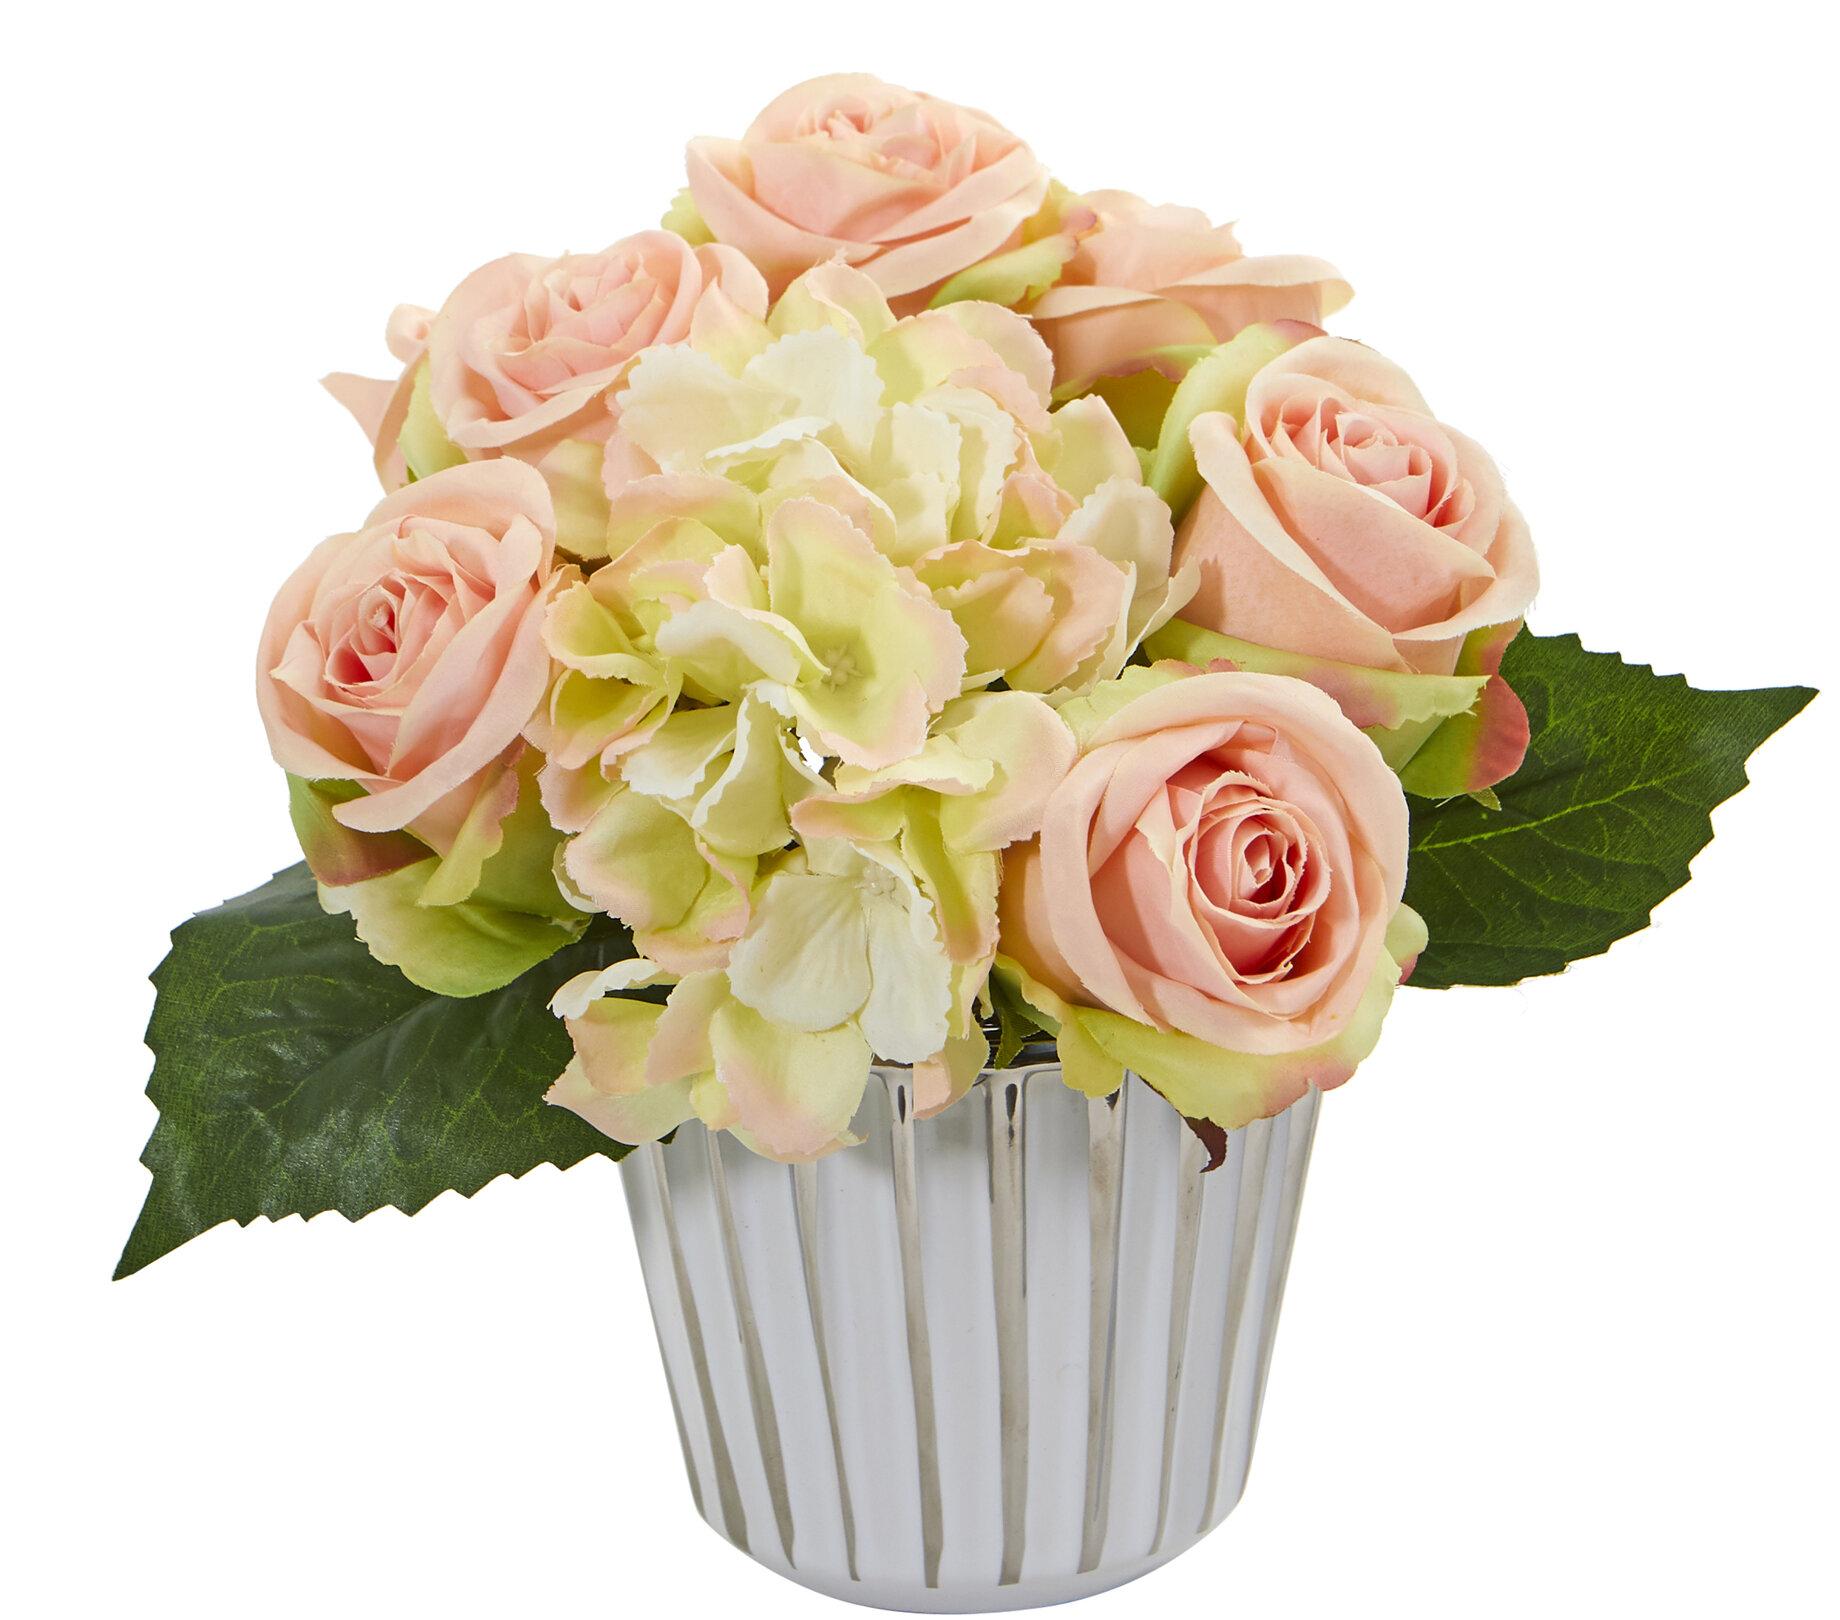 Rose And Hydrangea Bouquet Mixed Floral Arrangement In Vase Joss